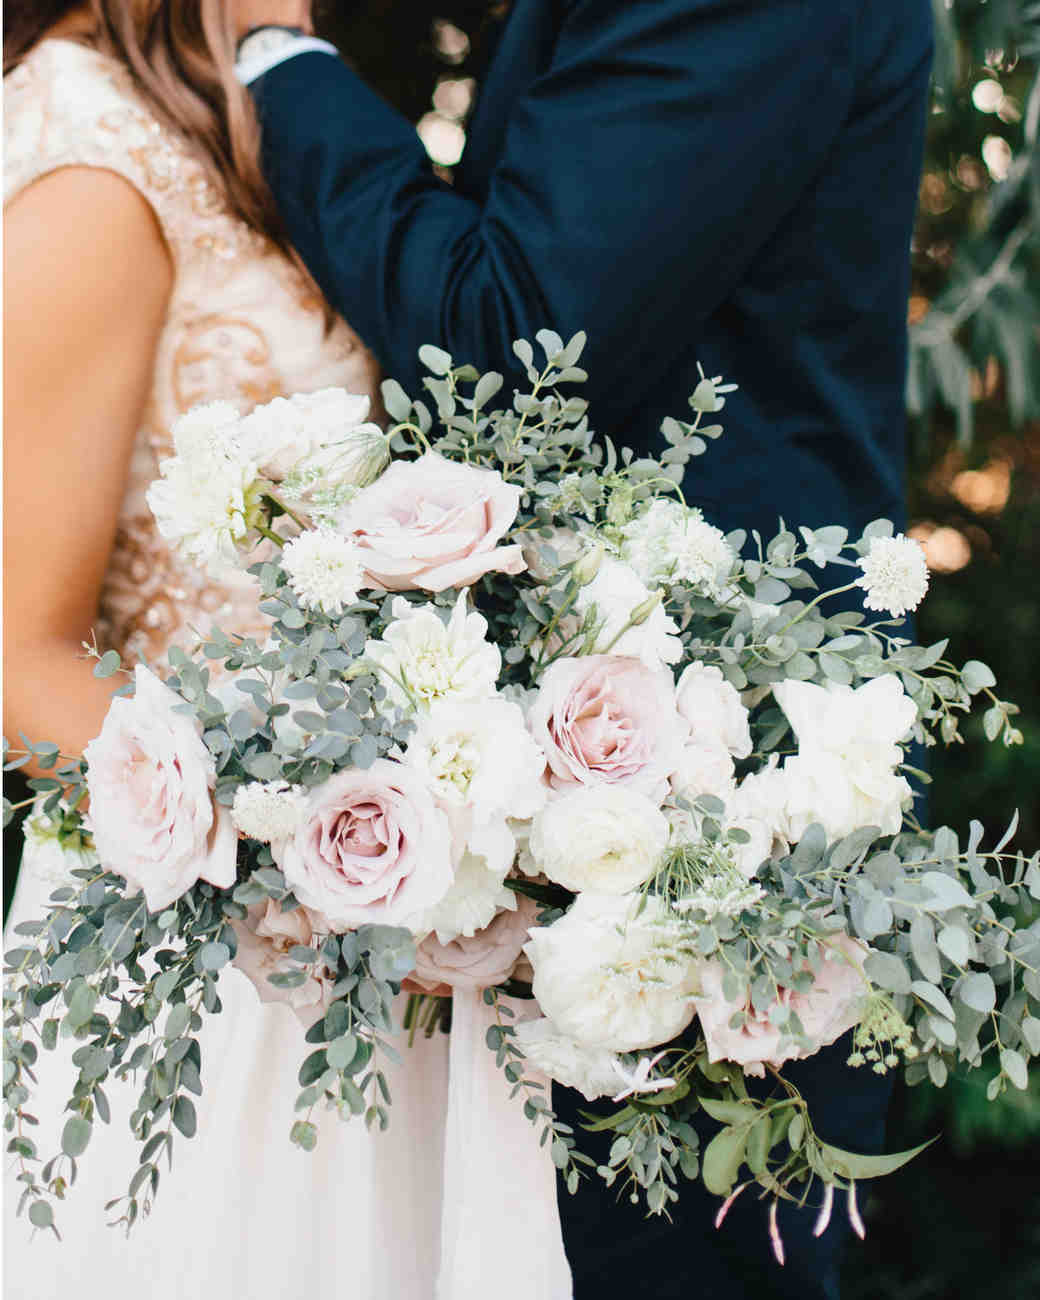 mackenzie-boman-wedding-bouquet-172-s112693-0316.jpg